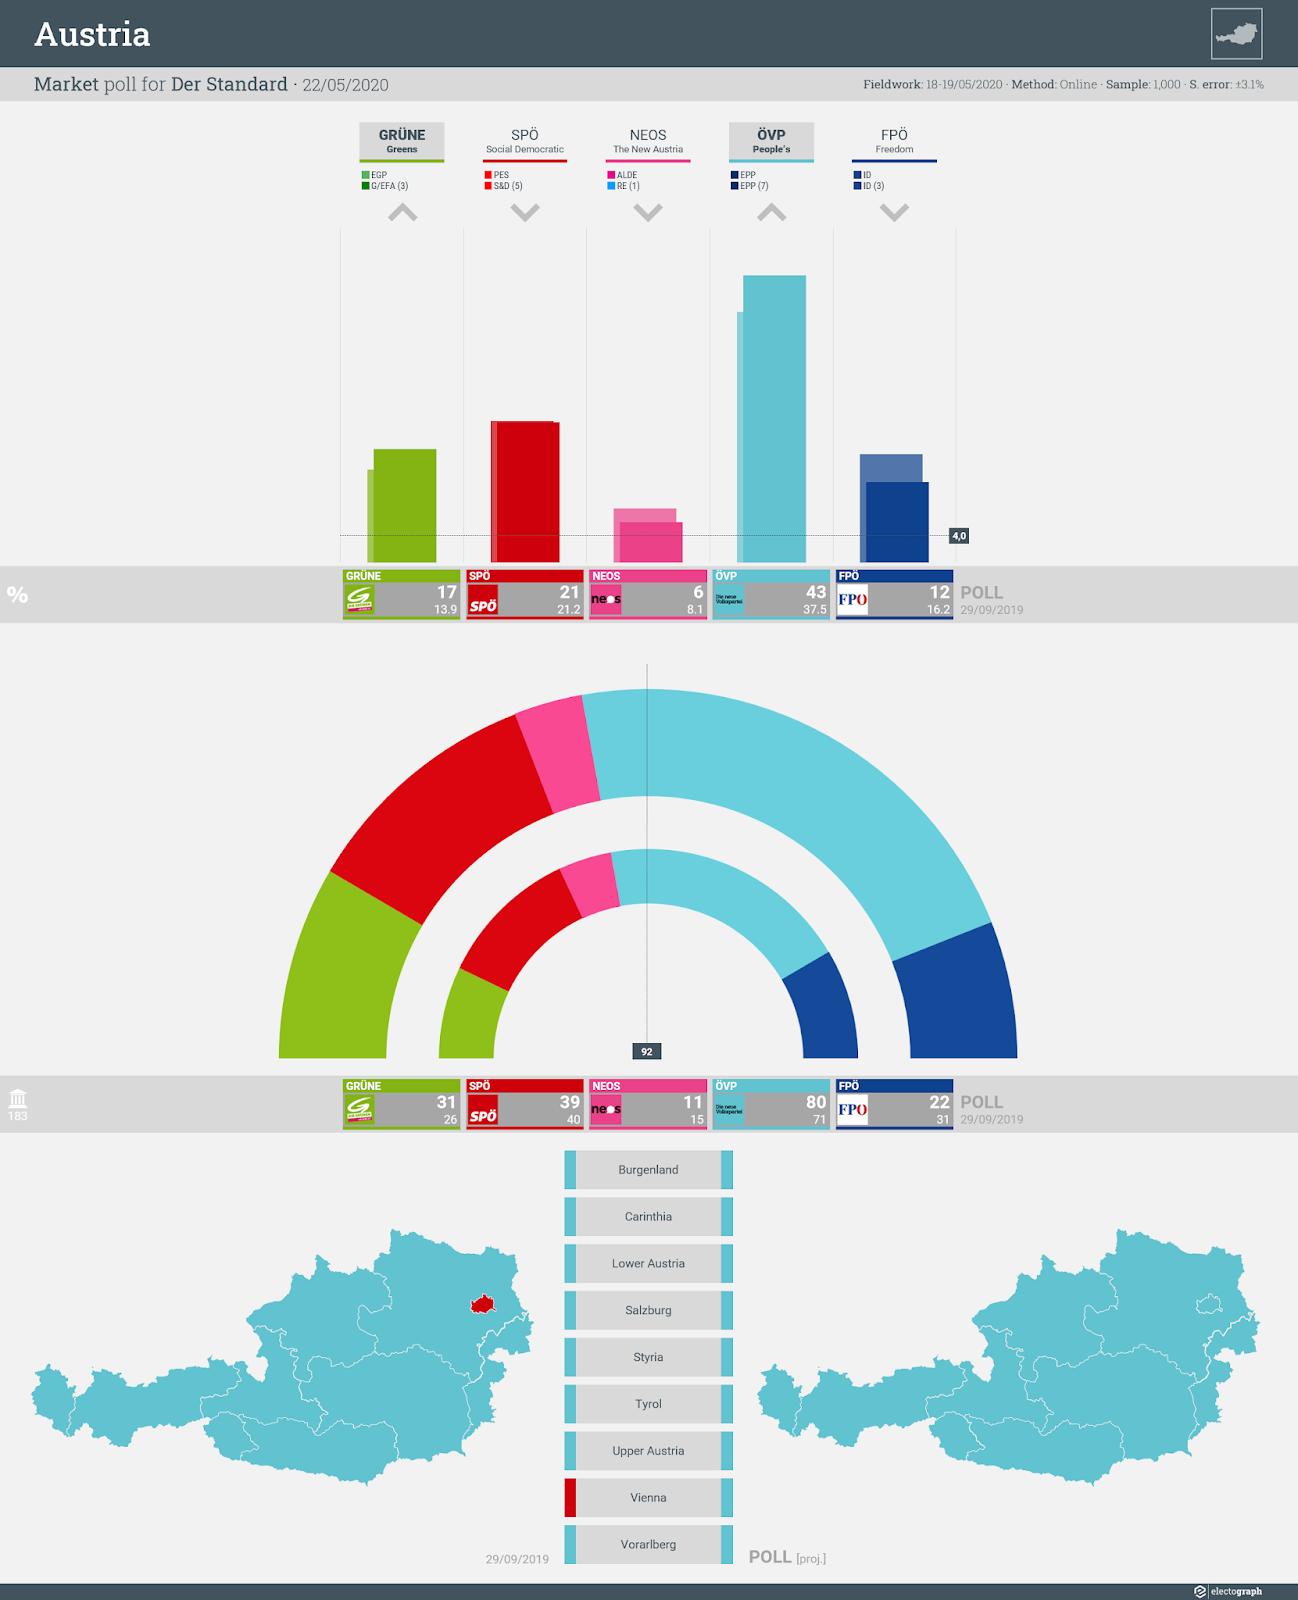 AUSTRIA: Market poll chart for Der Standard, 22 May 2020